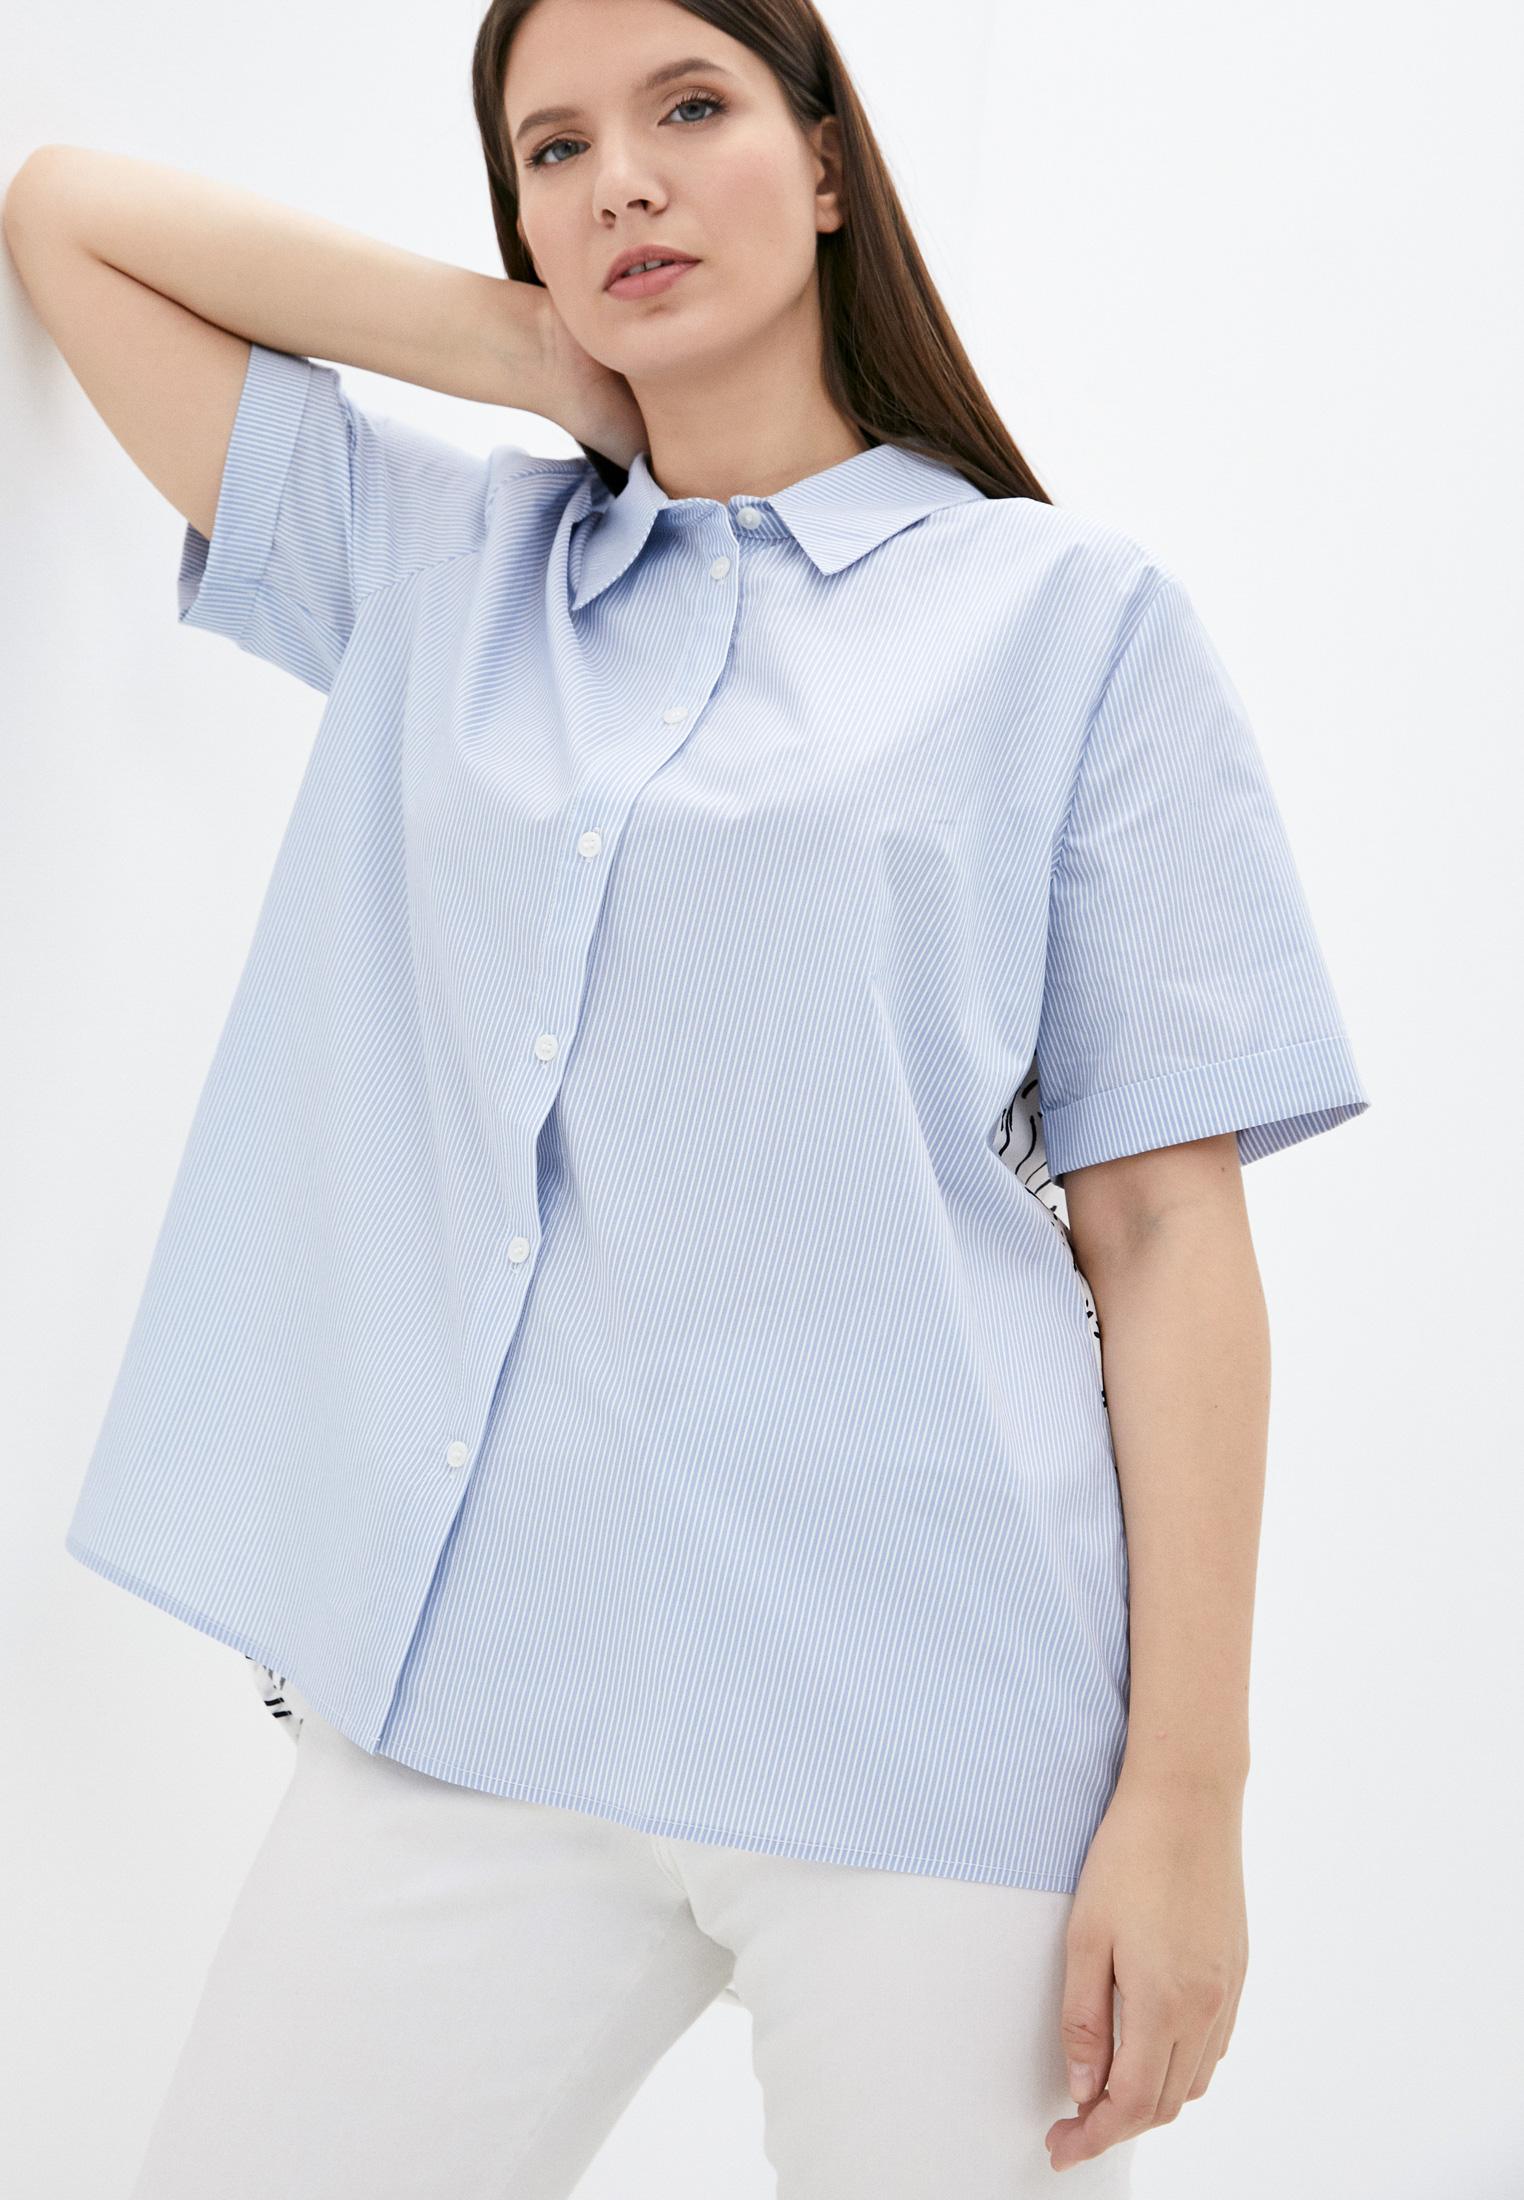 Рубашка Ulla Popken (Улла Пупкин) Рубашка Ulla Popken